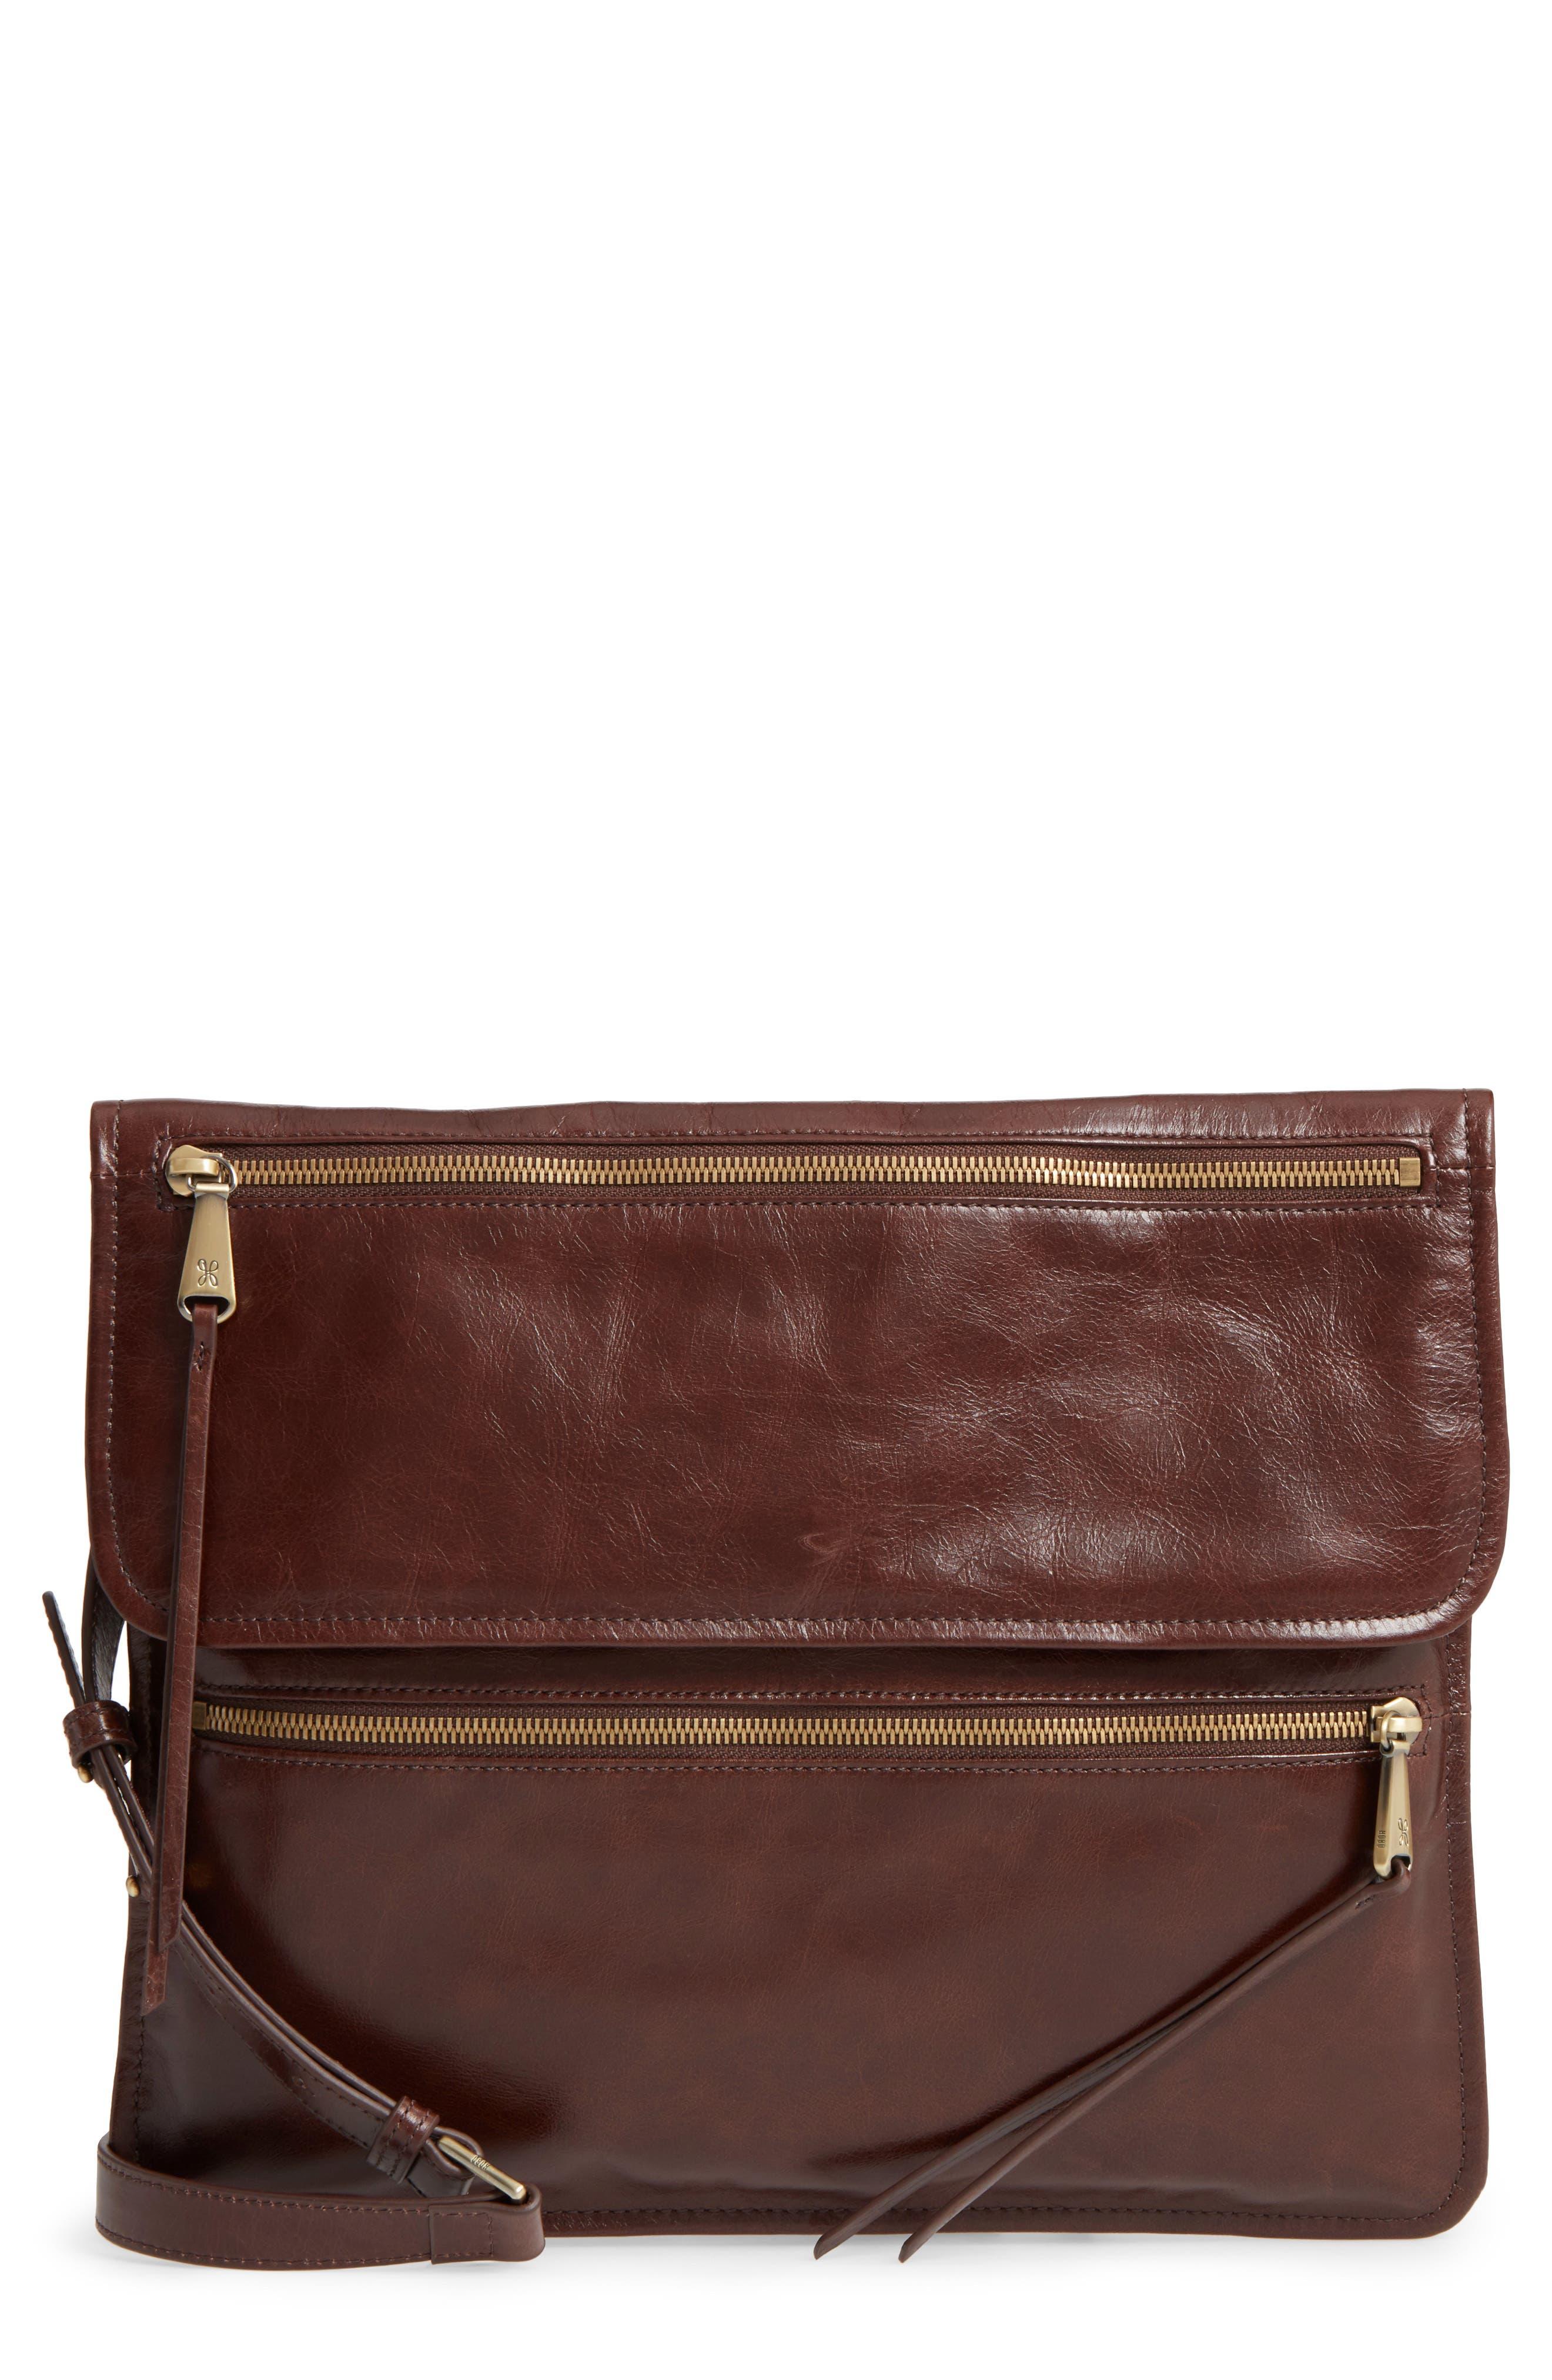 Main Image - Hobo Vista Calfskin Leather Messenger Bag